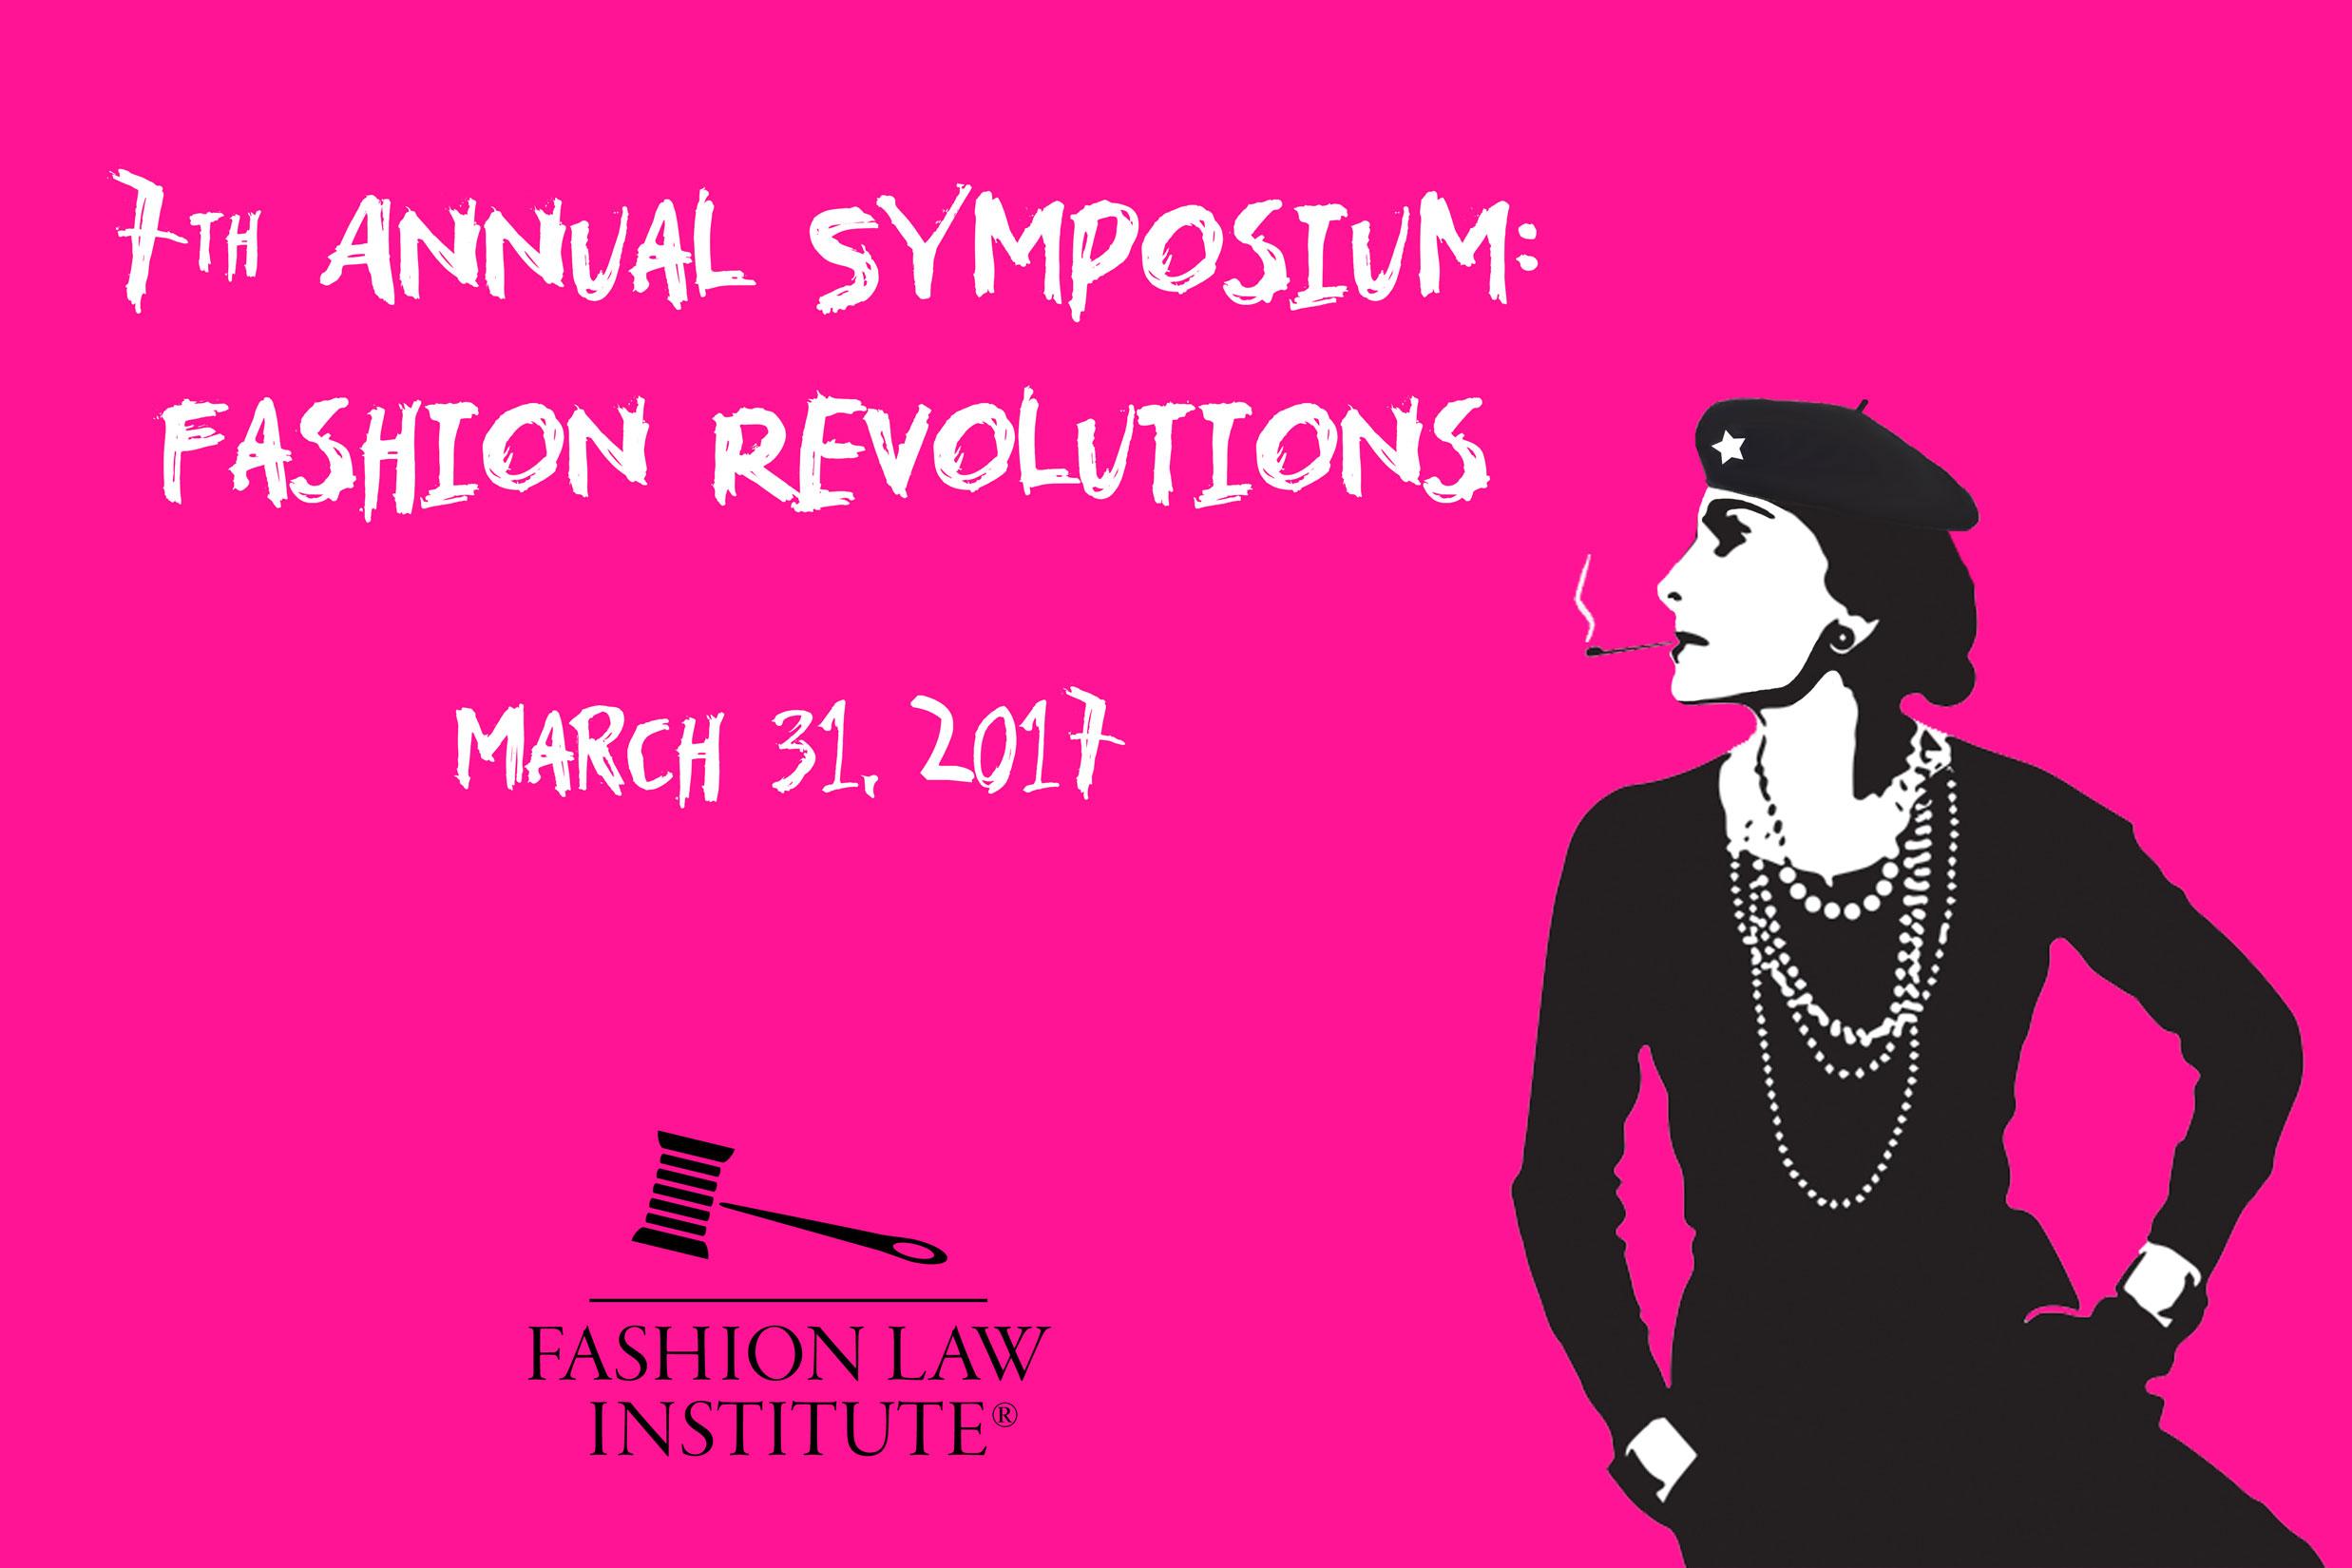 Fashion Revolutions - 7th Annual Fashion Law institute Symposium